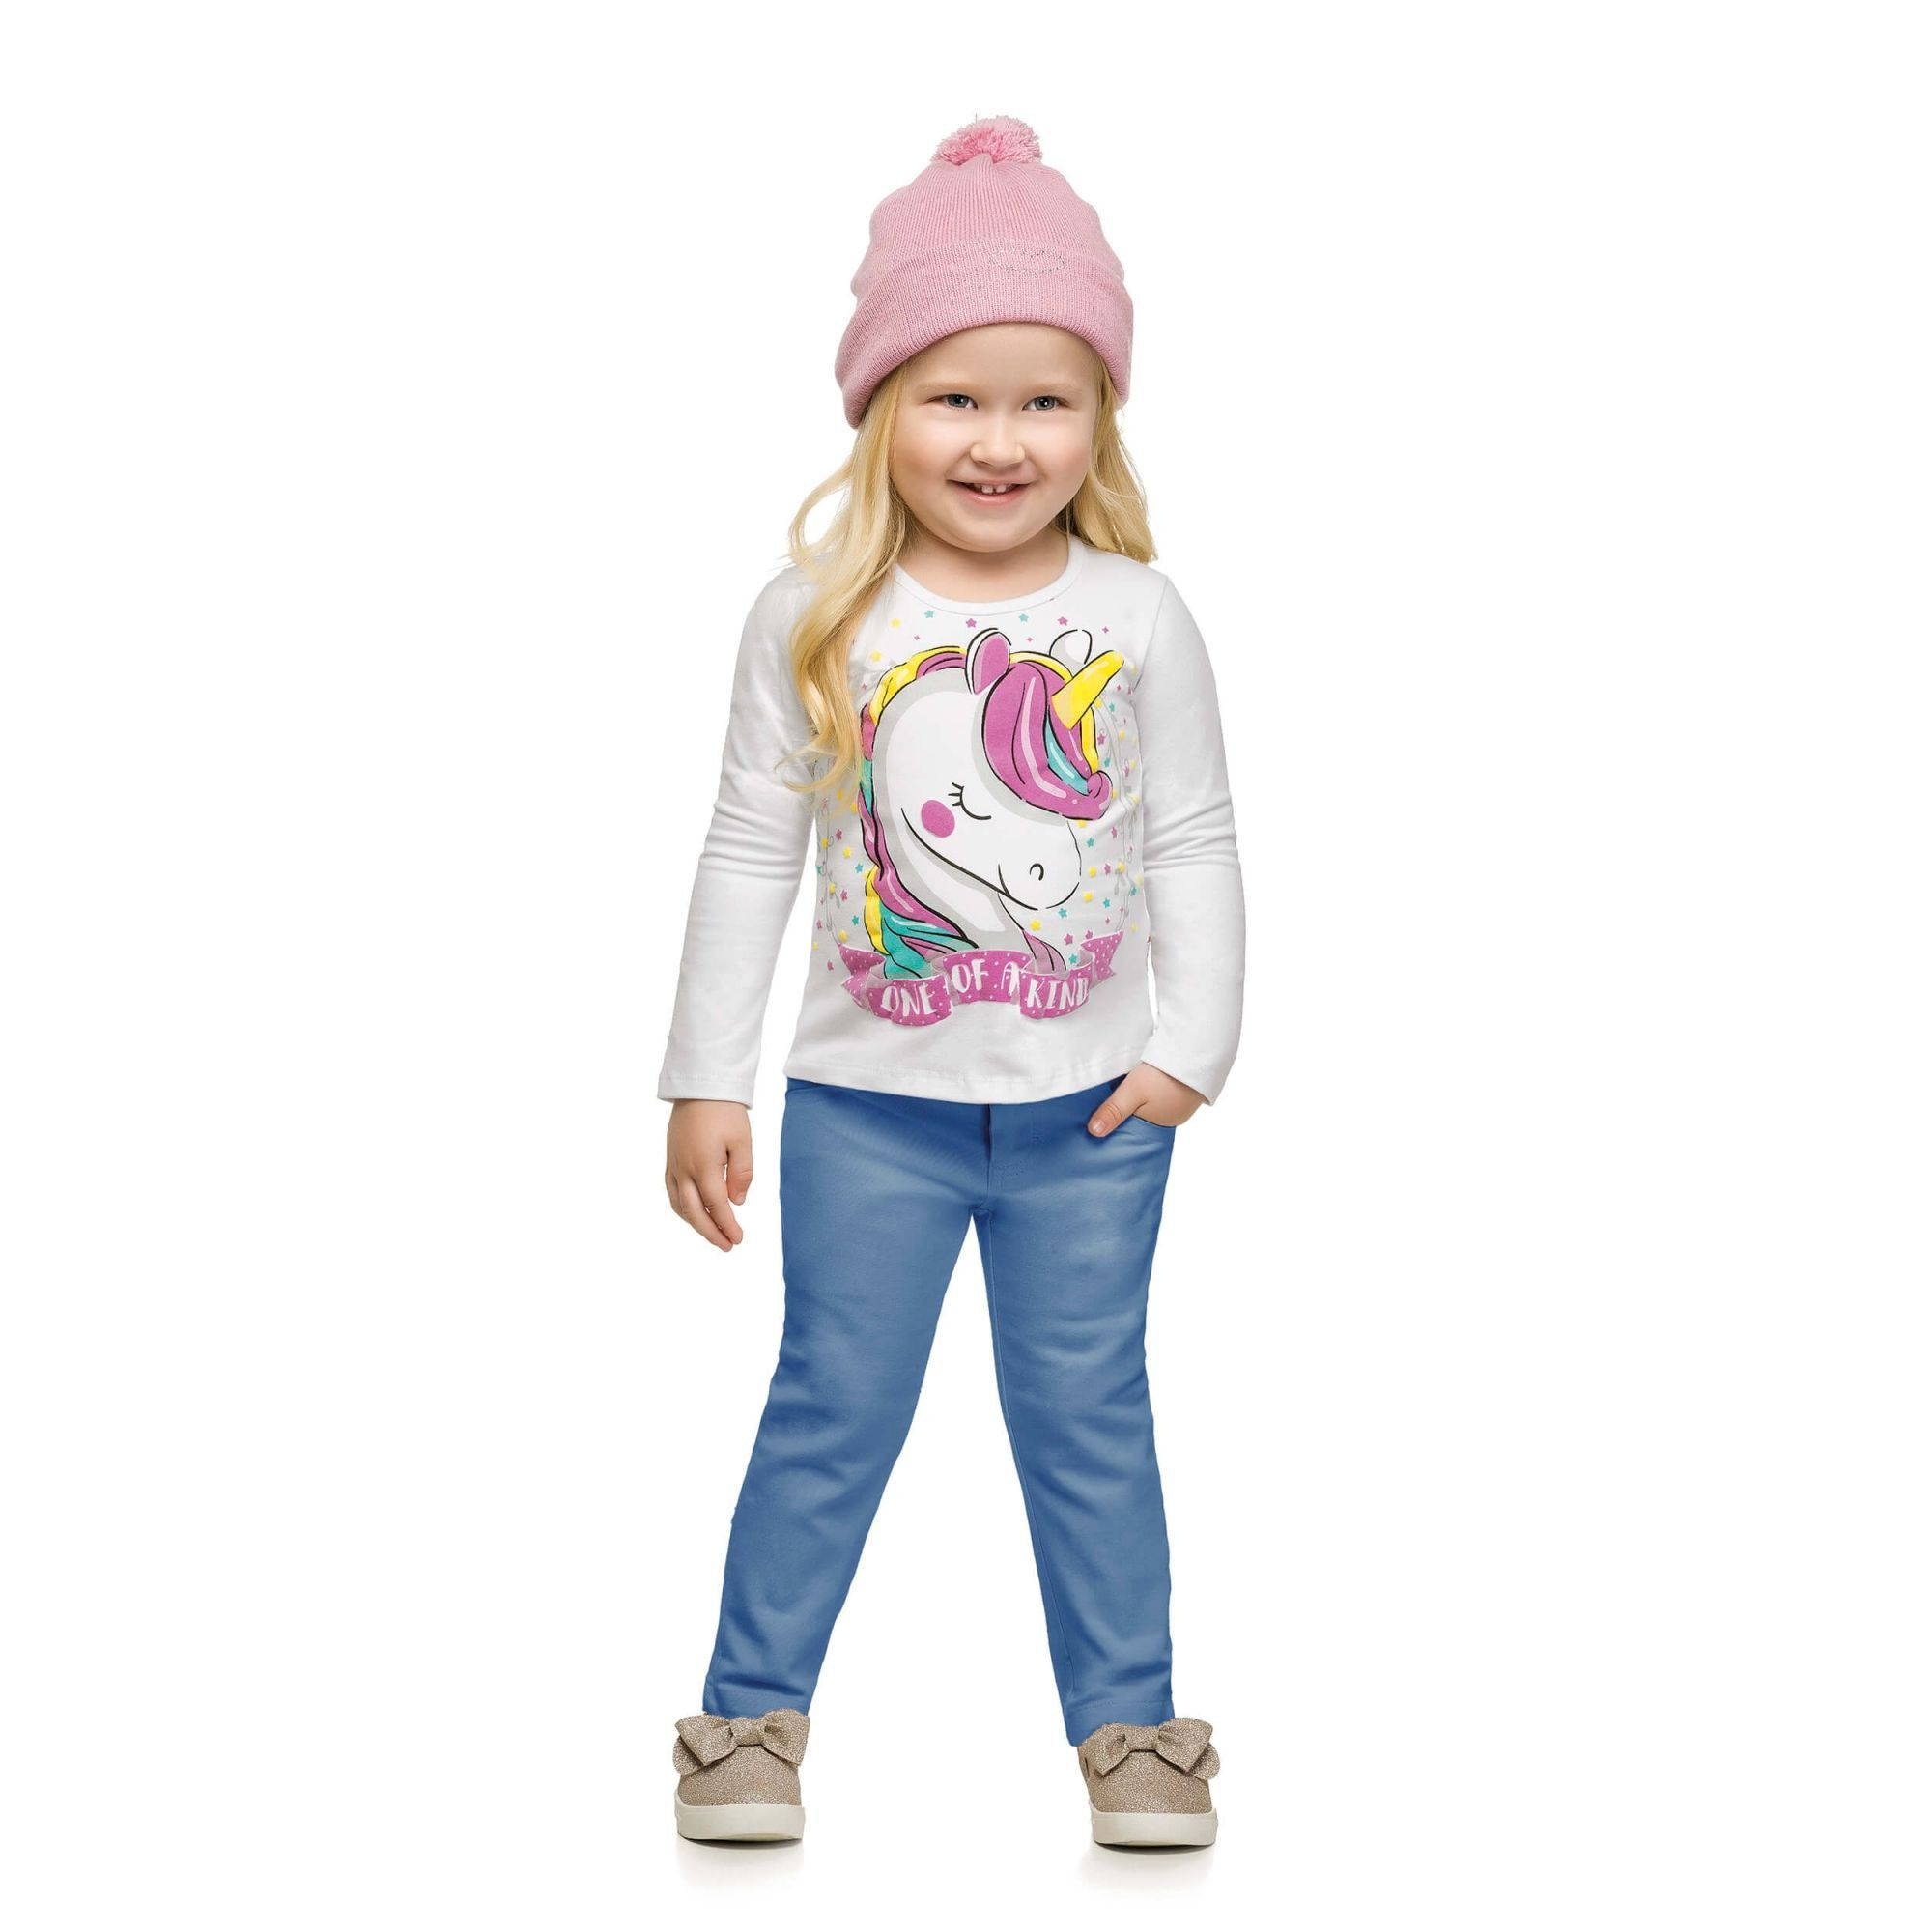 Blusa Infantil Feminina Feminina Inverno Branca Unicórnio Elian